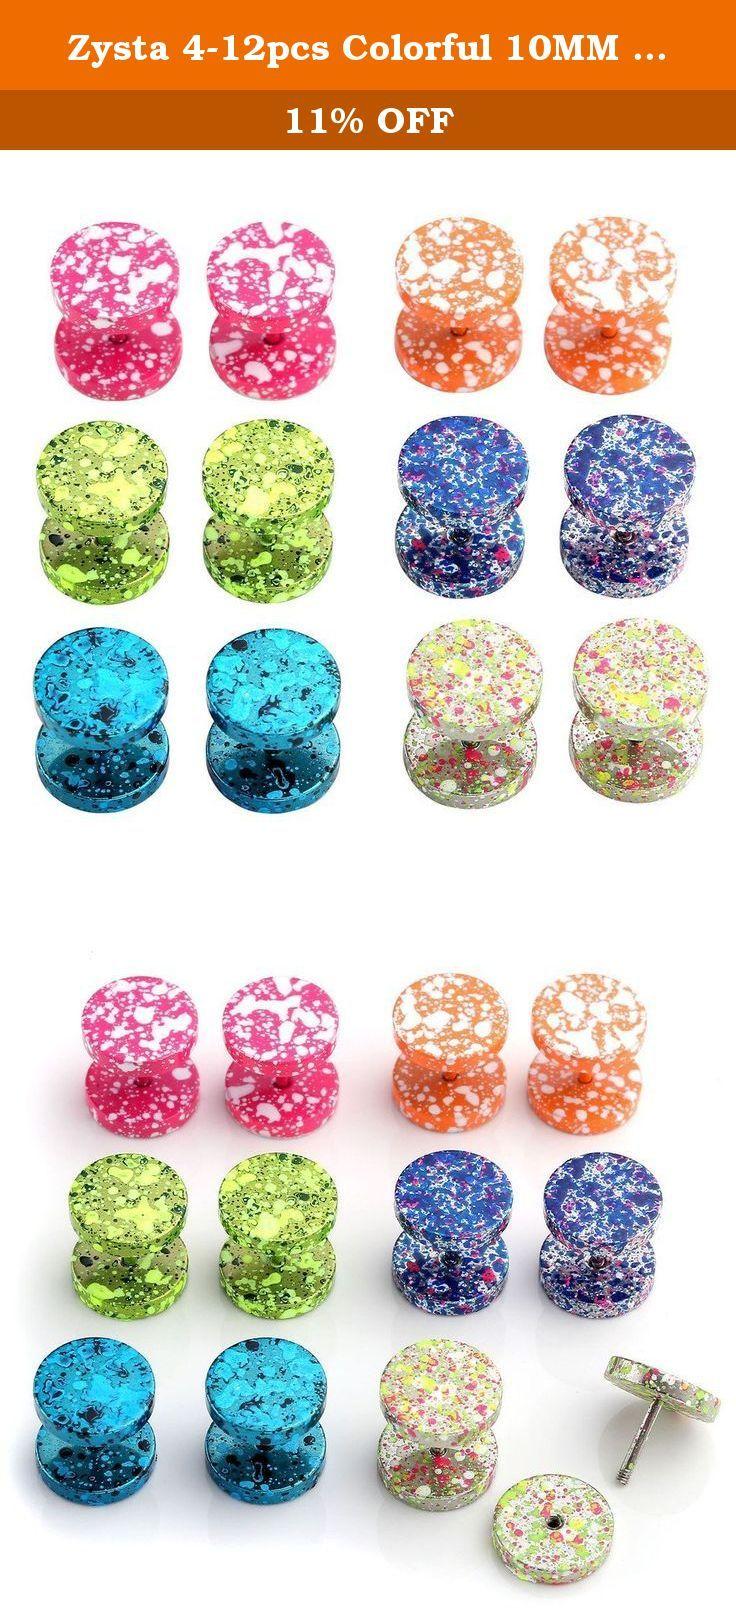 04dfe330b9398 Zysta 4-12pcs Colorful 10MM Screw Stud Earrings Mens Stainless Steel ...